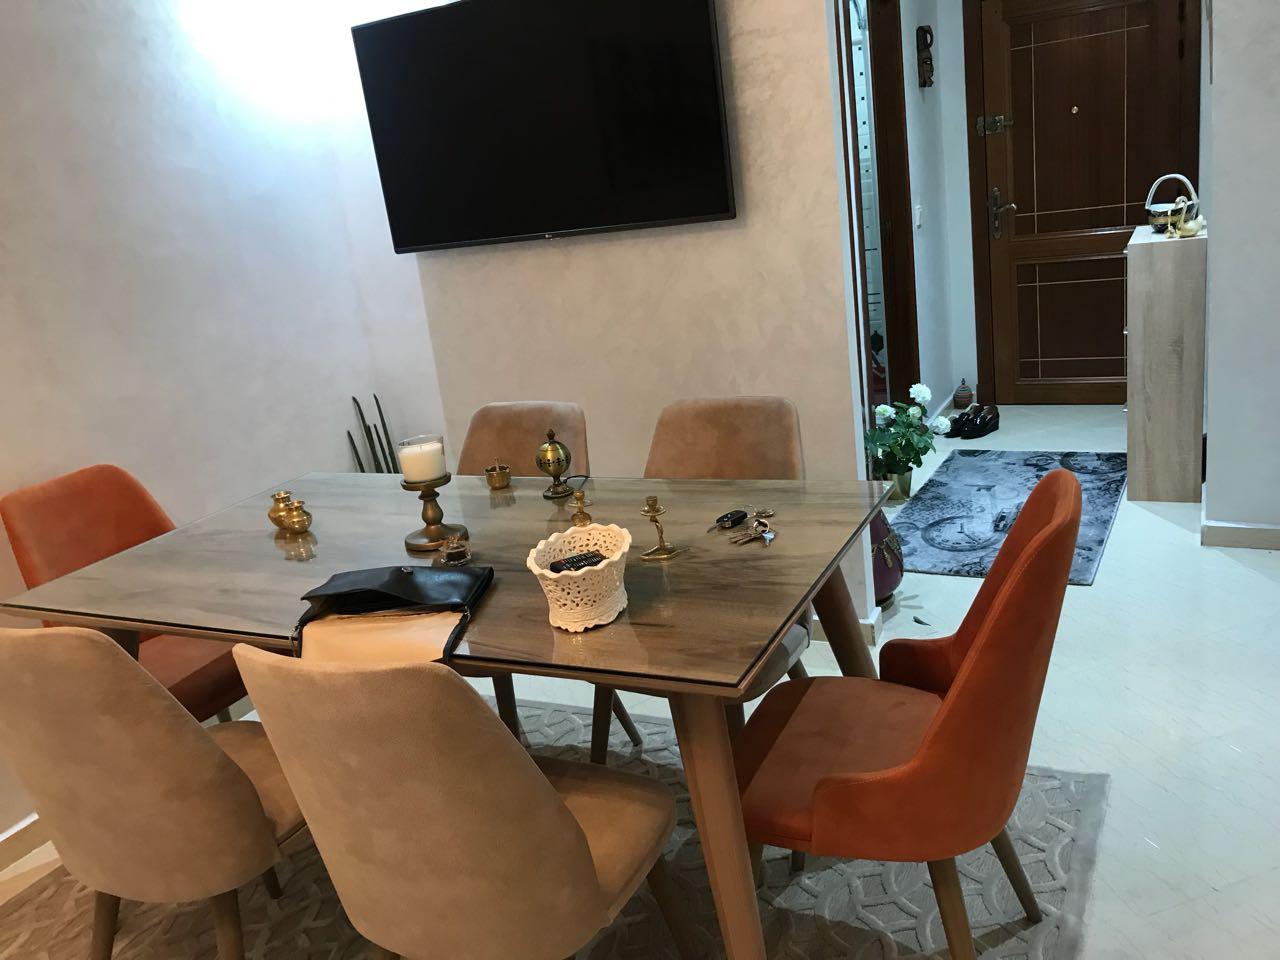 Image belle studio meublé wifi ascenseur parking ain sebaa casablanca maroc 0